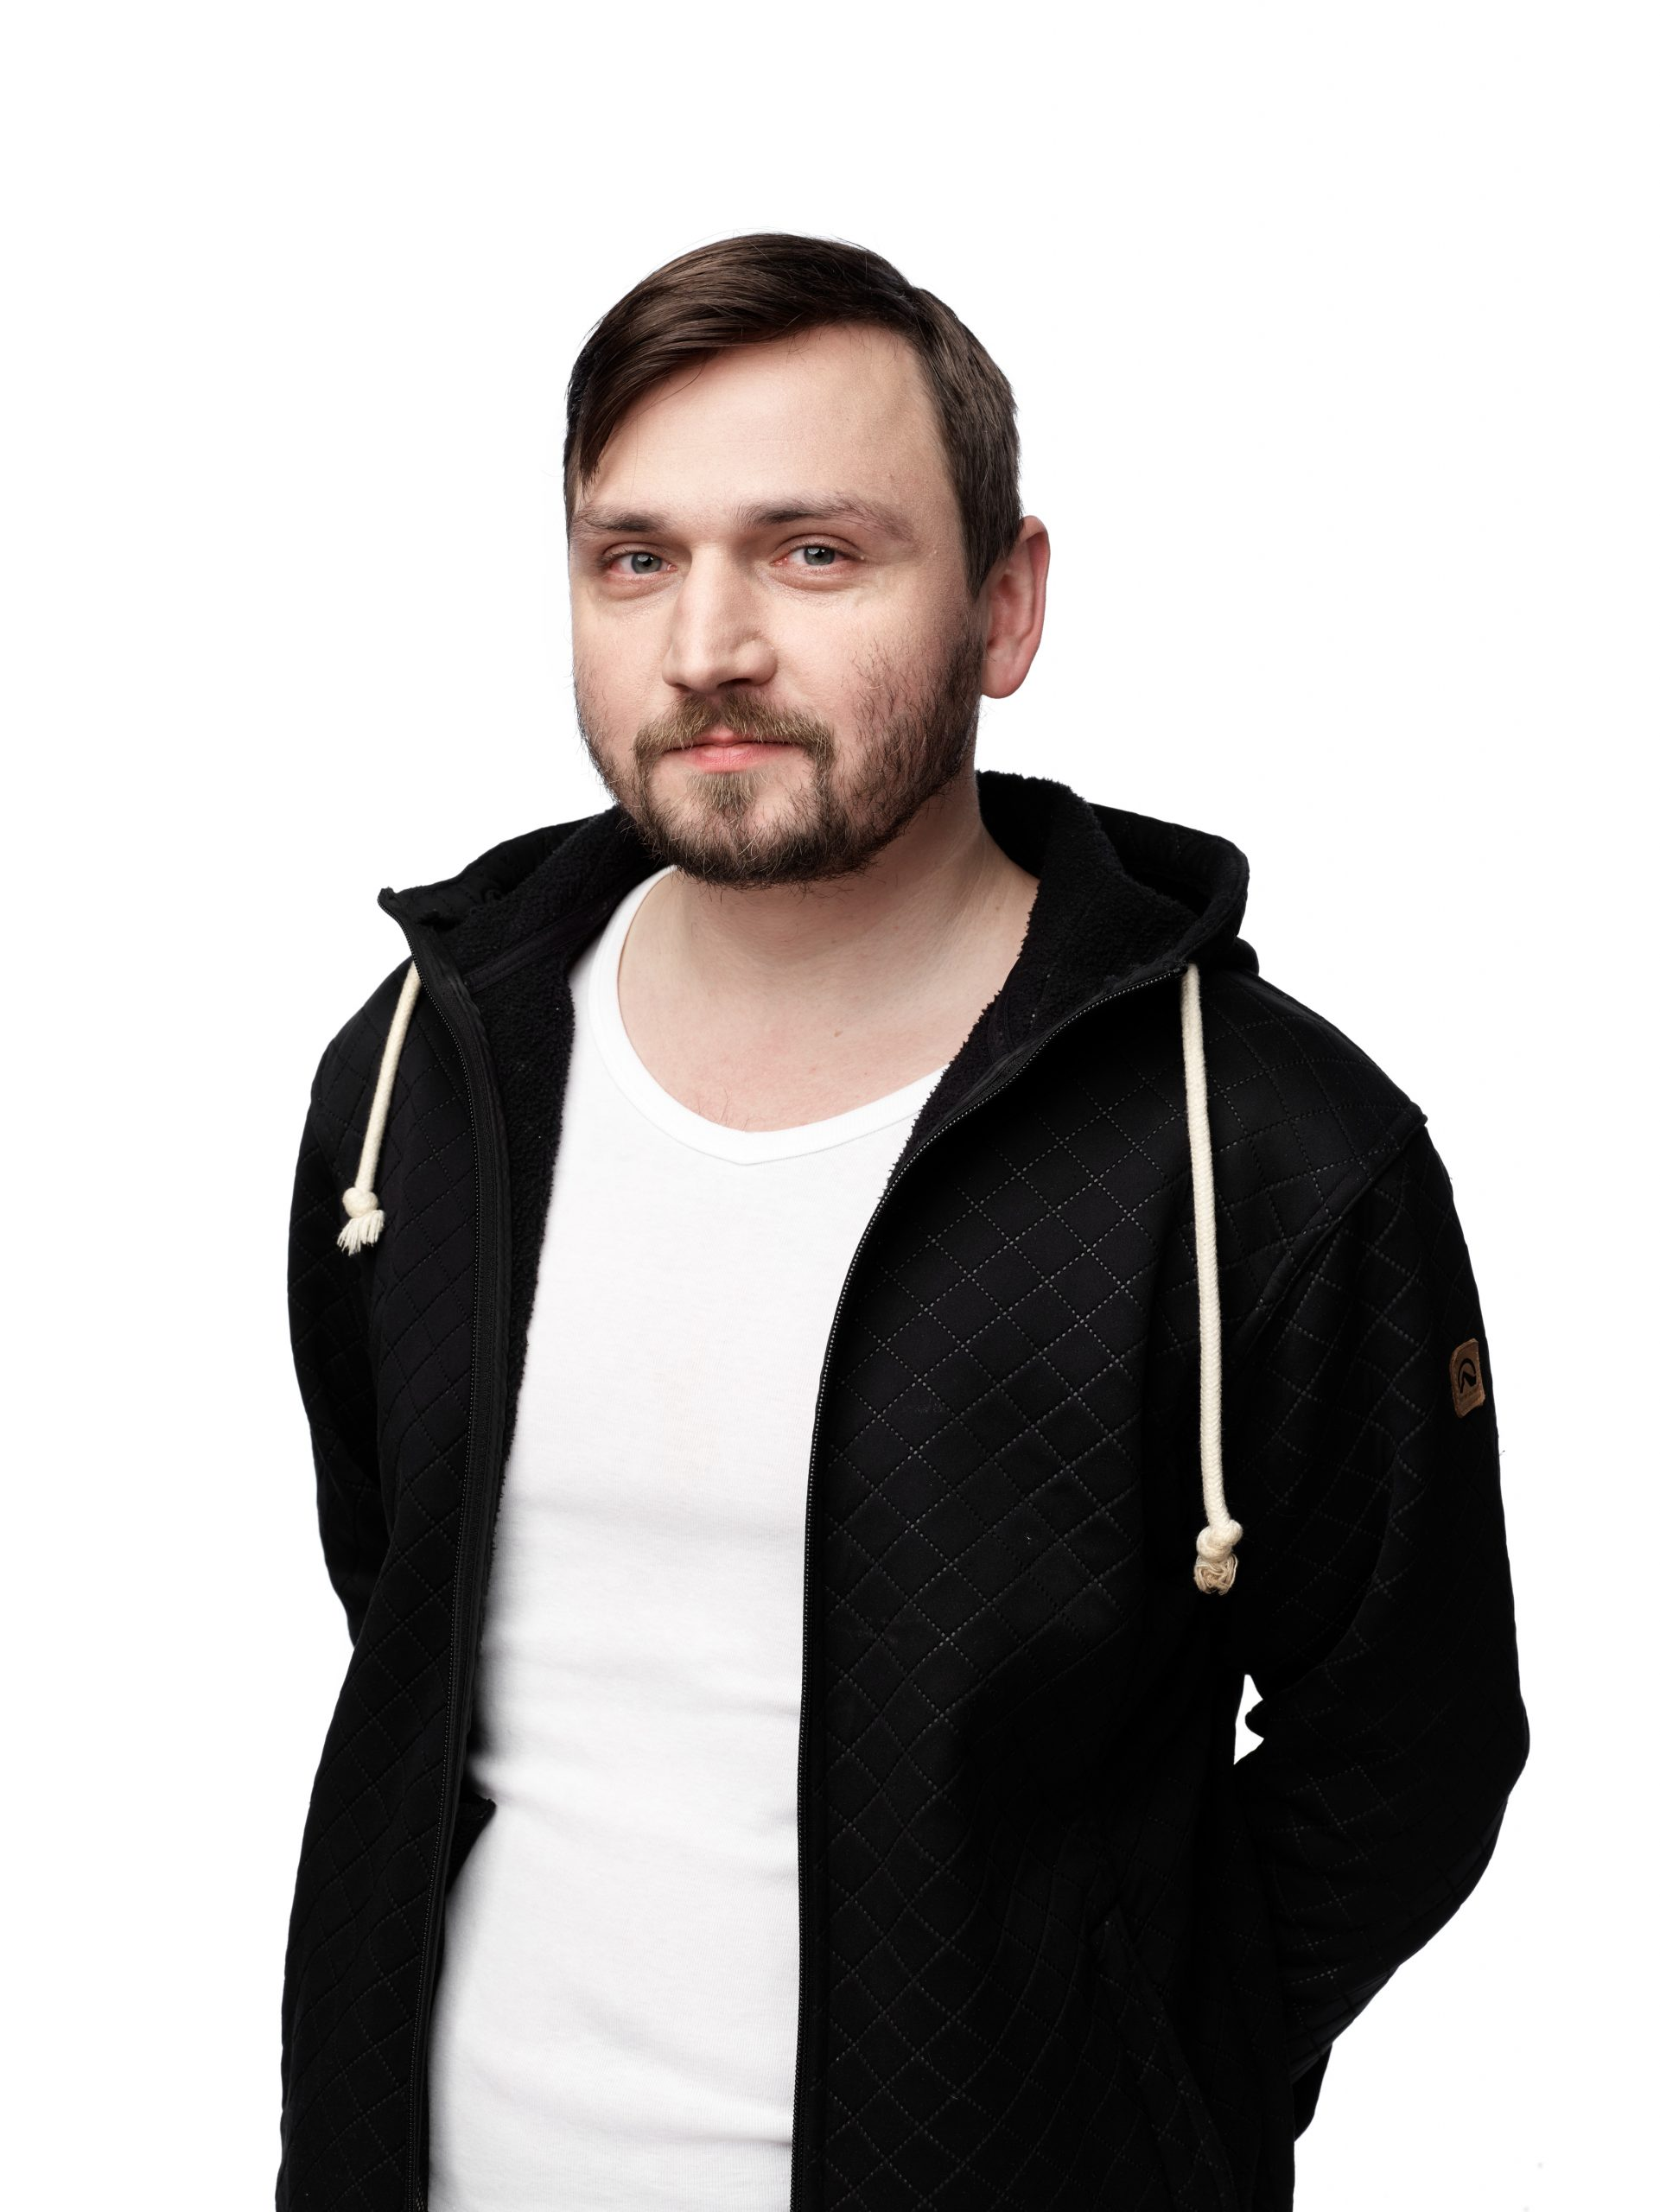 Zdeněk Kocián (Činohra)